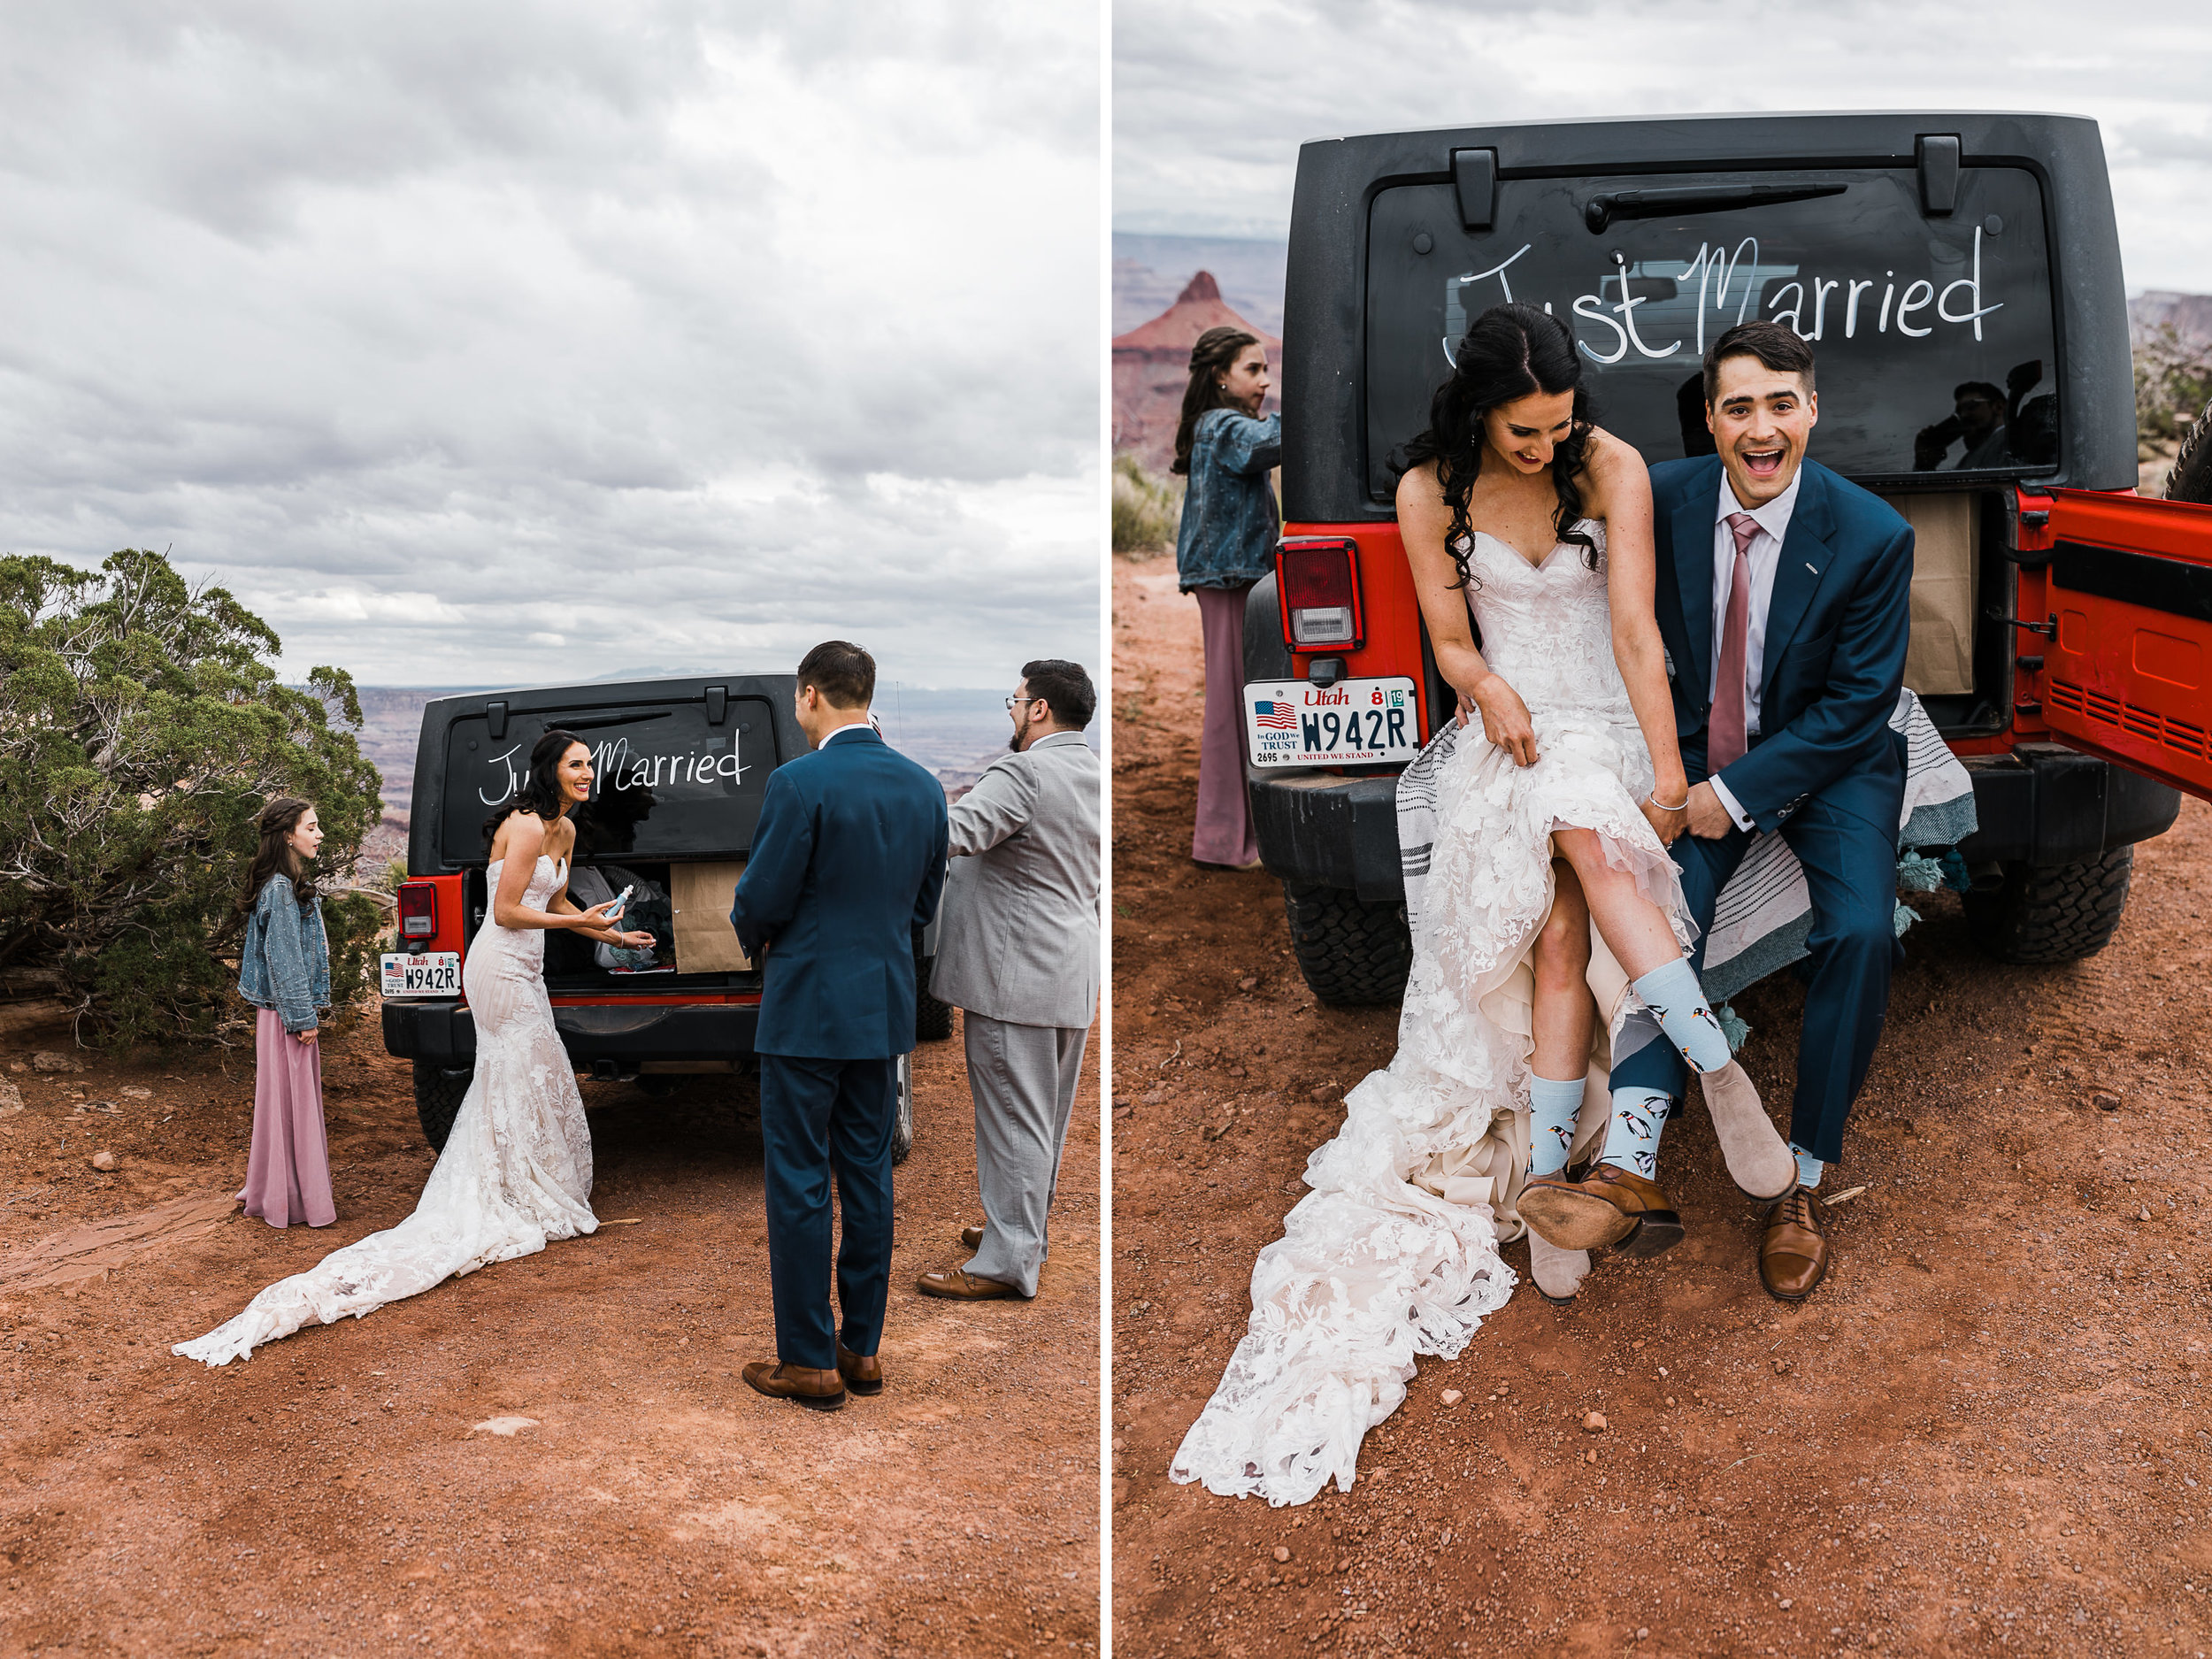 Jeep-Wedding-Moab-Utah-Hearnes-Adventure-Elopement-Photography-15.jpg